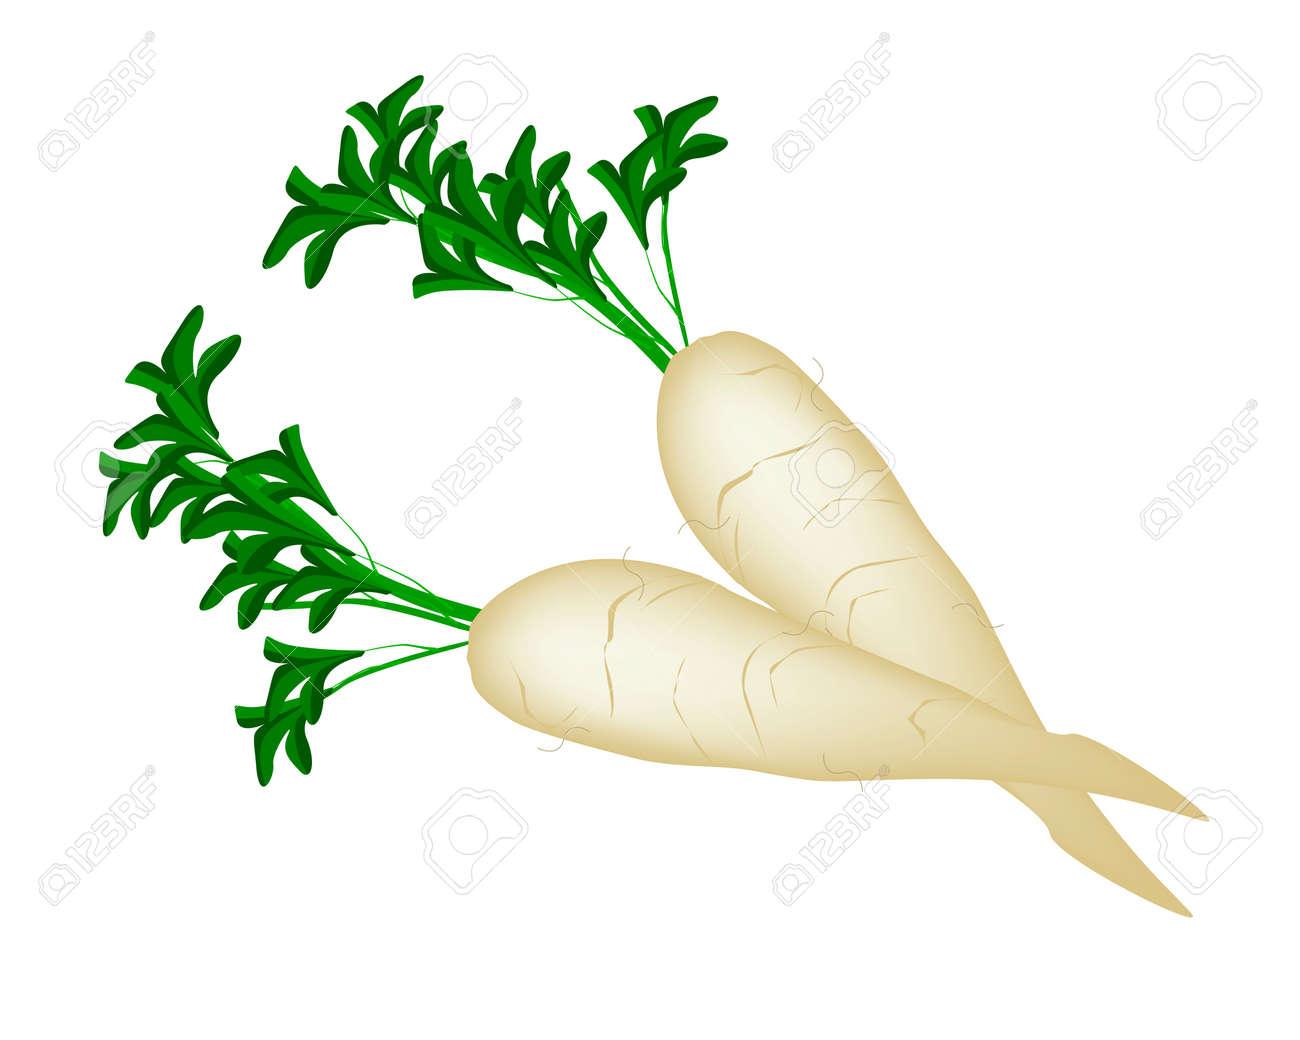 vegetable vector illustration of fresh white radishes or daikon rh 123rf com radish clipart black and white picture of radish clipart